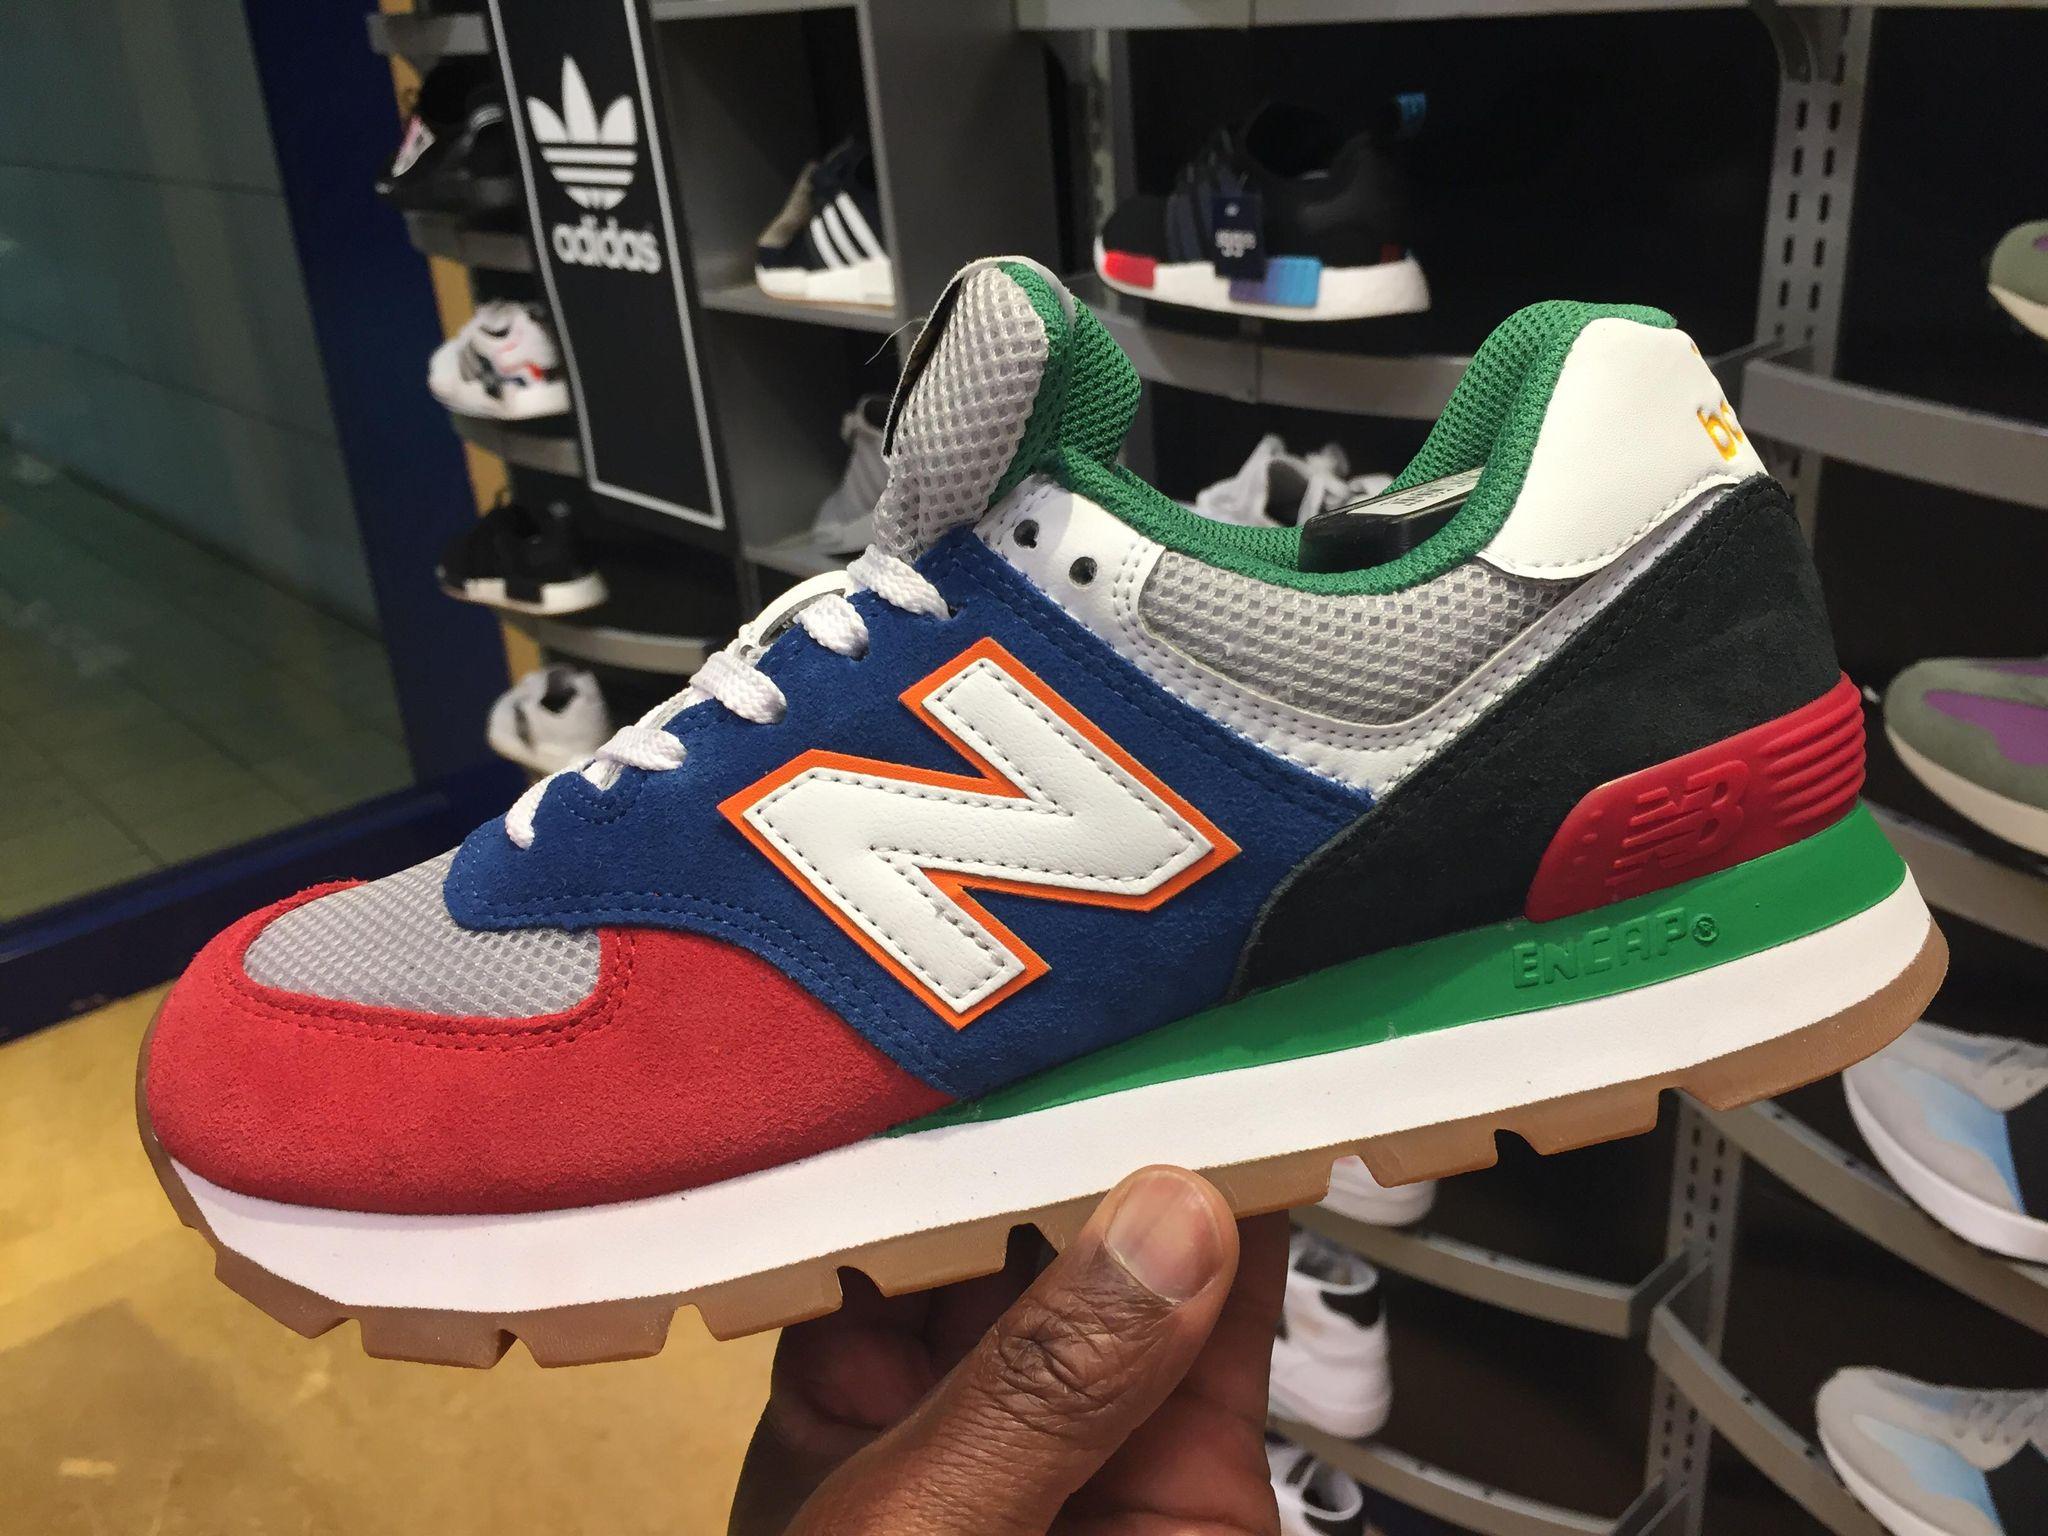 new balance 574 red green blue